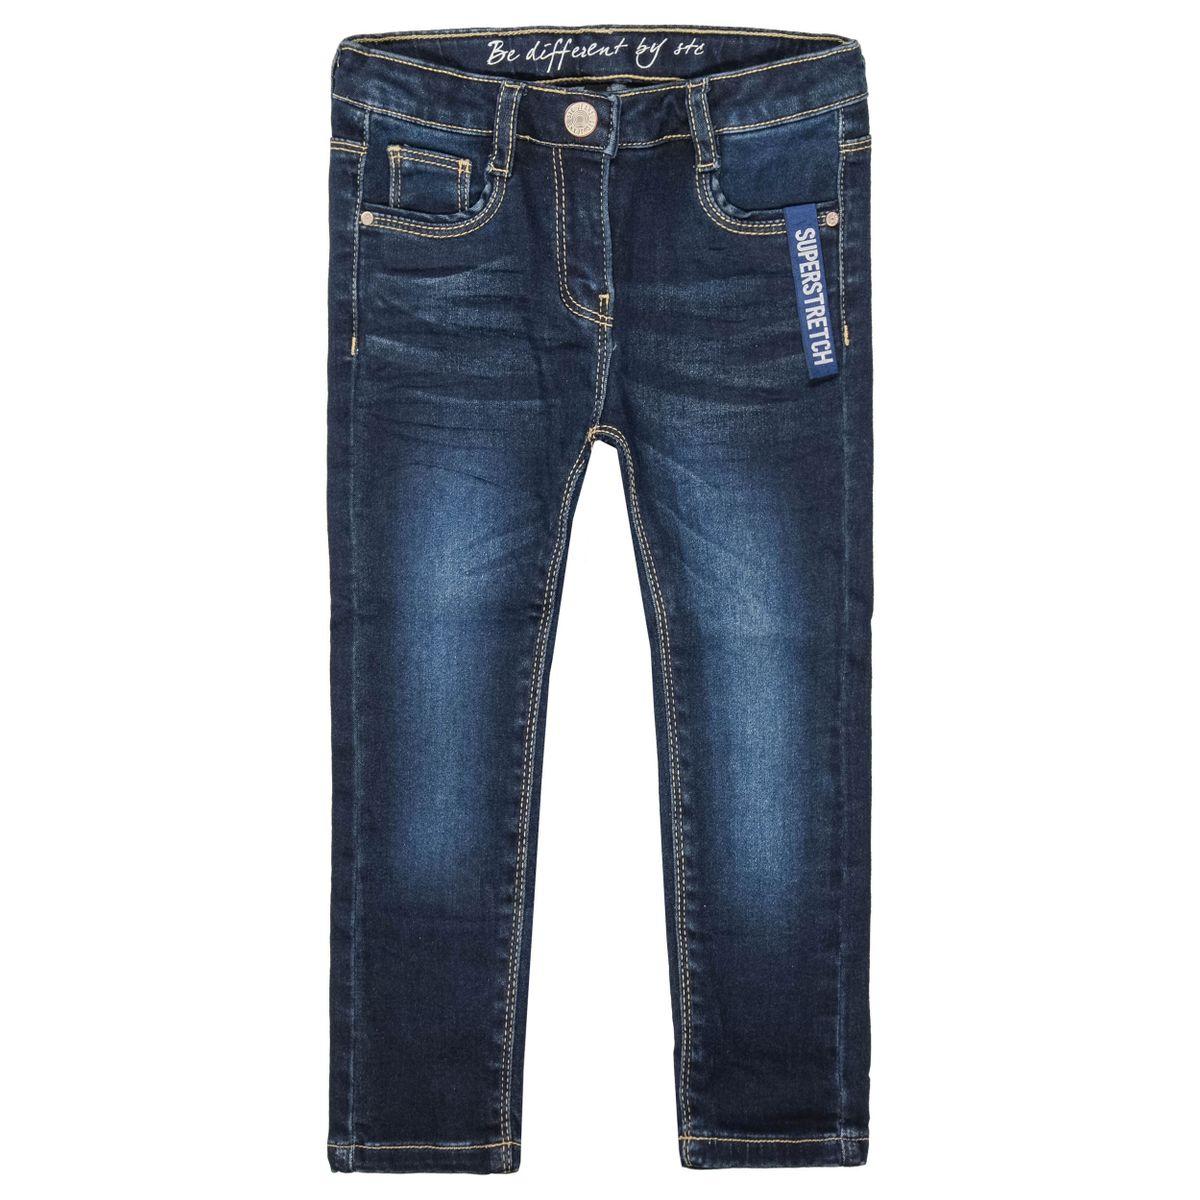 Mädchen Skinny Jeans Regular Fit - Dark Blue Denim